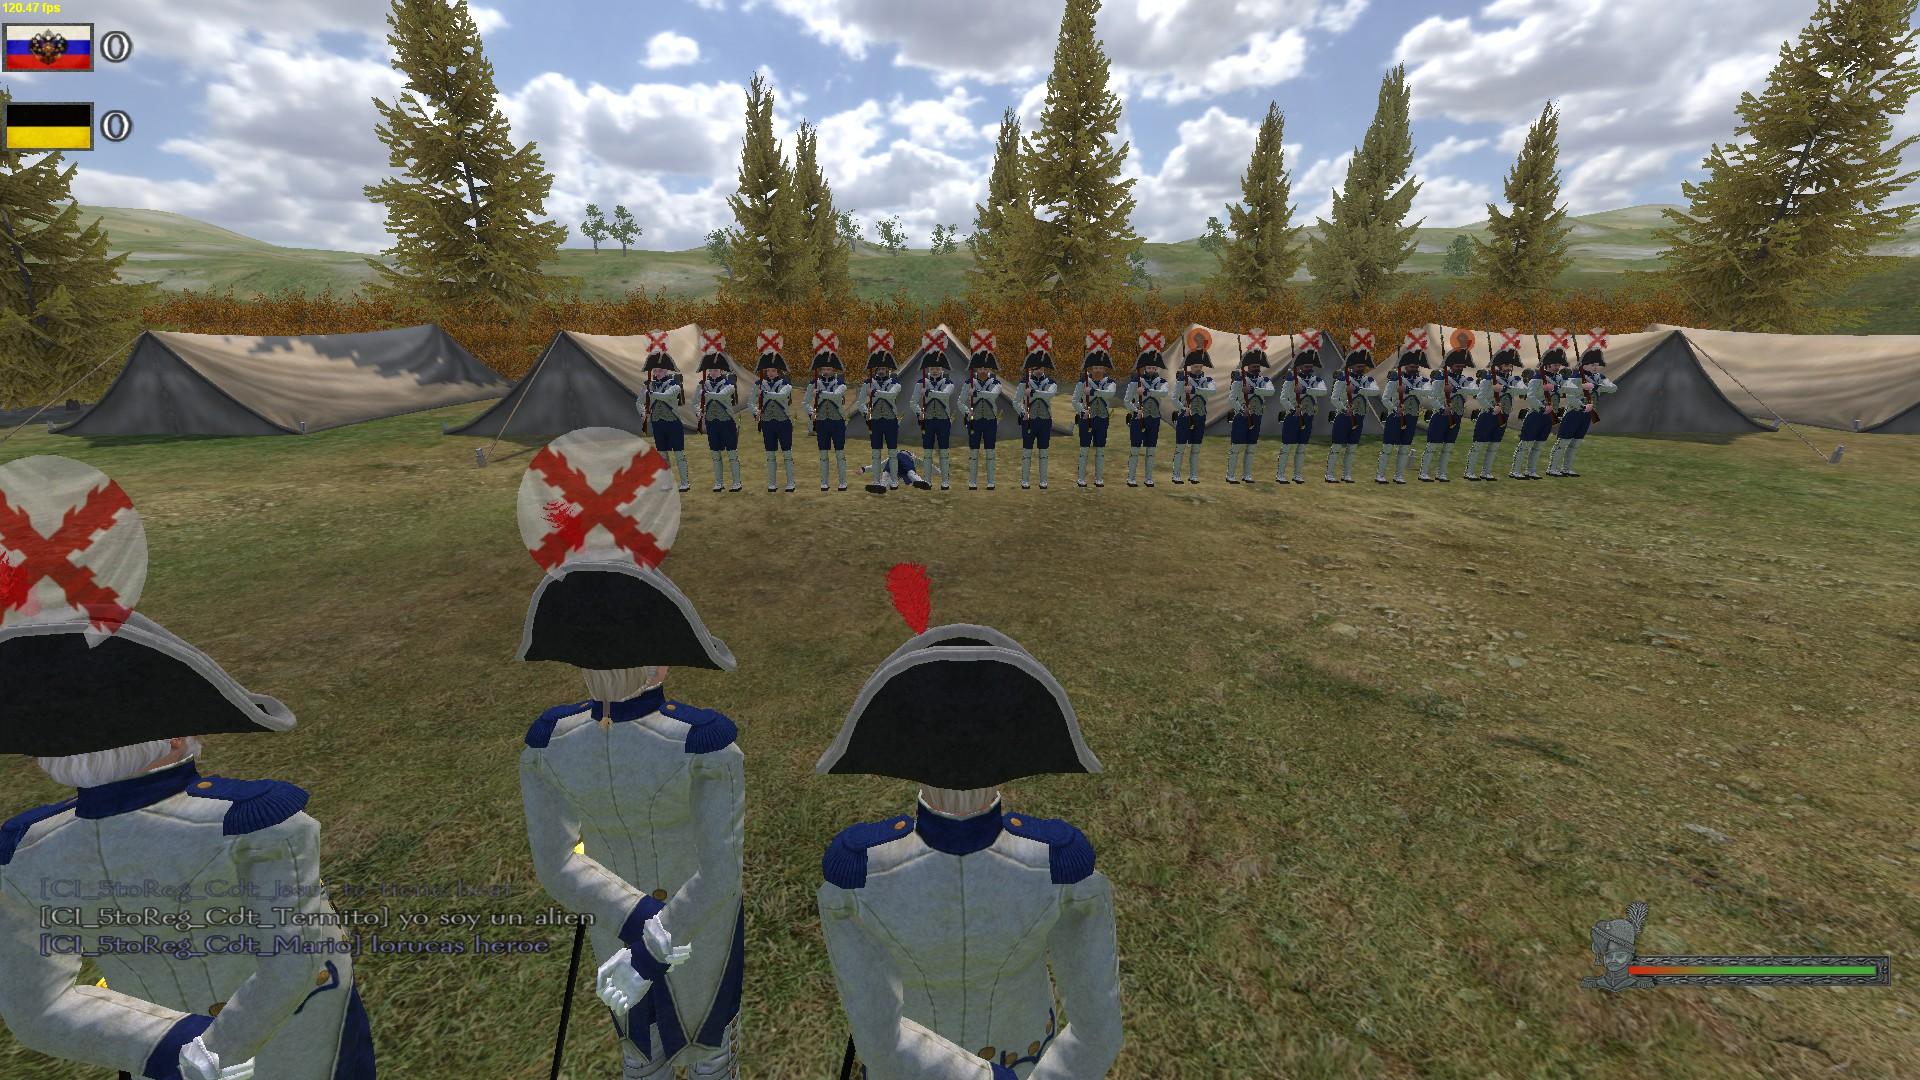 [CI] 5to Regimiento de la Corona | Reclutando Nuevos Miembros ! 221B1269A78B5916BBF5A3F40B36147F90E347A8